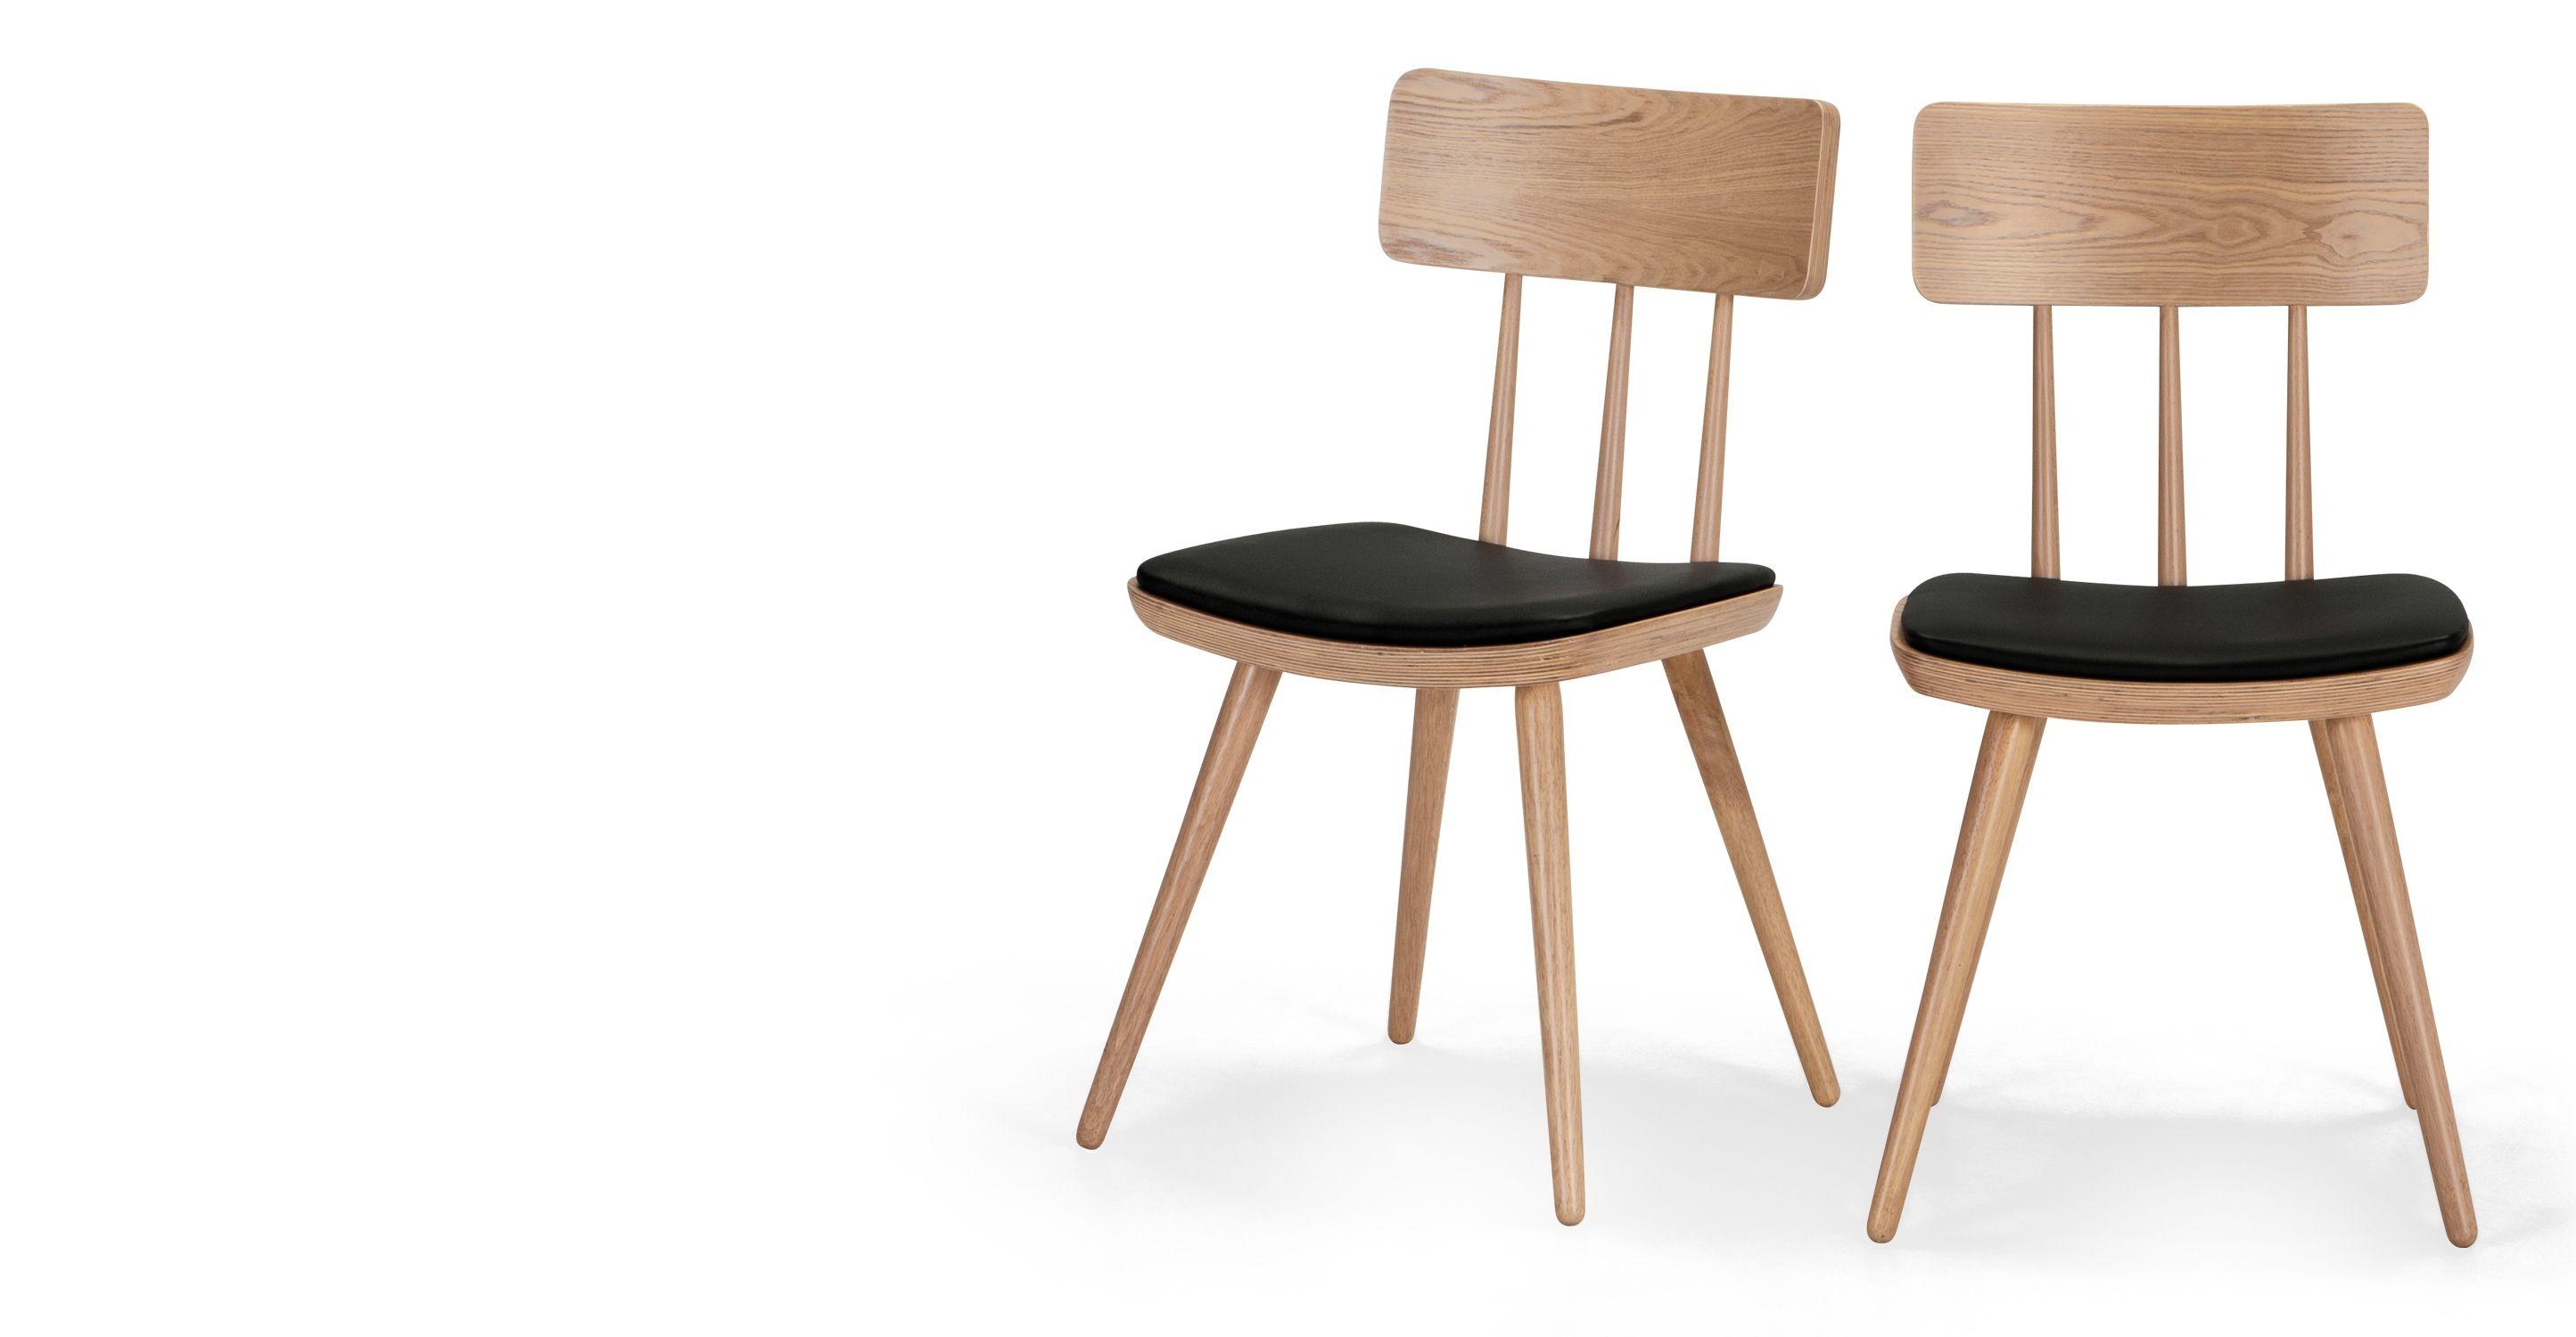 2 x Kitson chaises, frêne naturel et noir | made.com